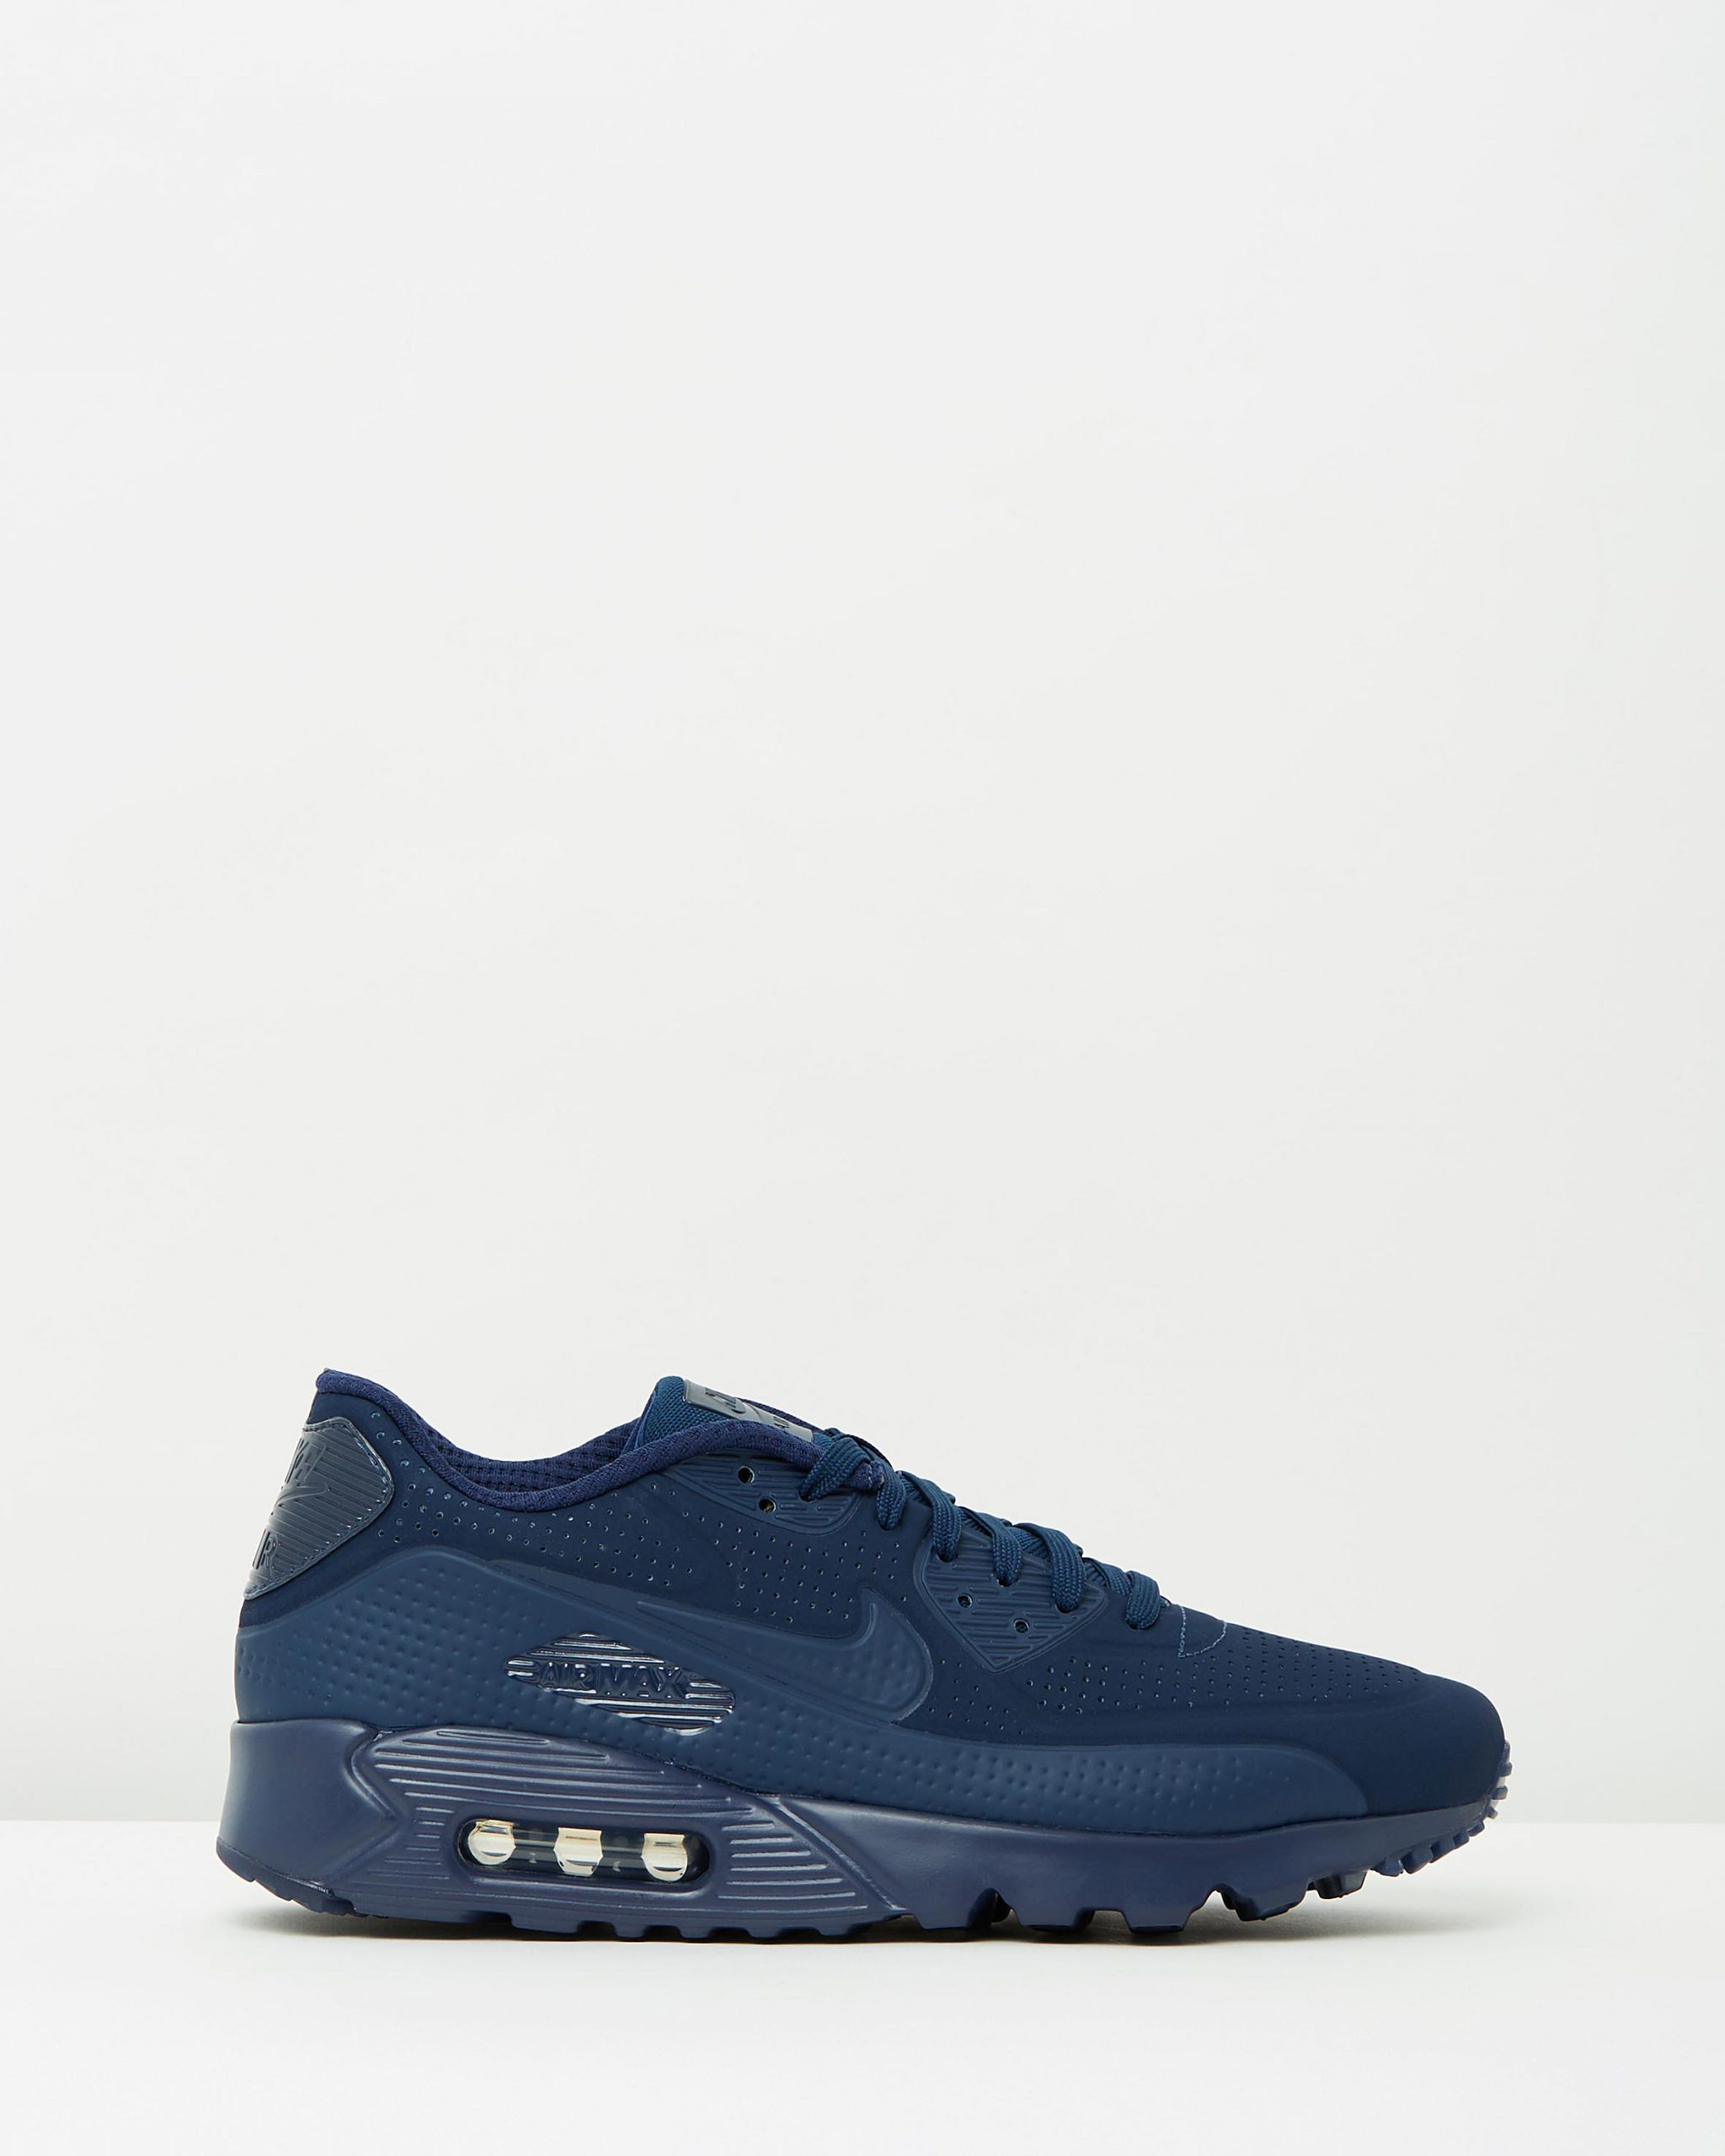 Nike Air Max 90 Ultra Moire Midnight Blue